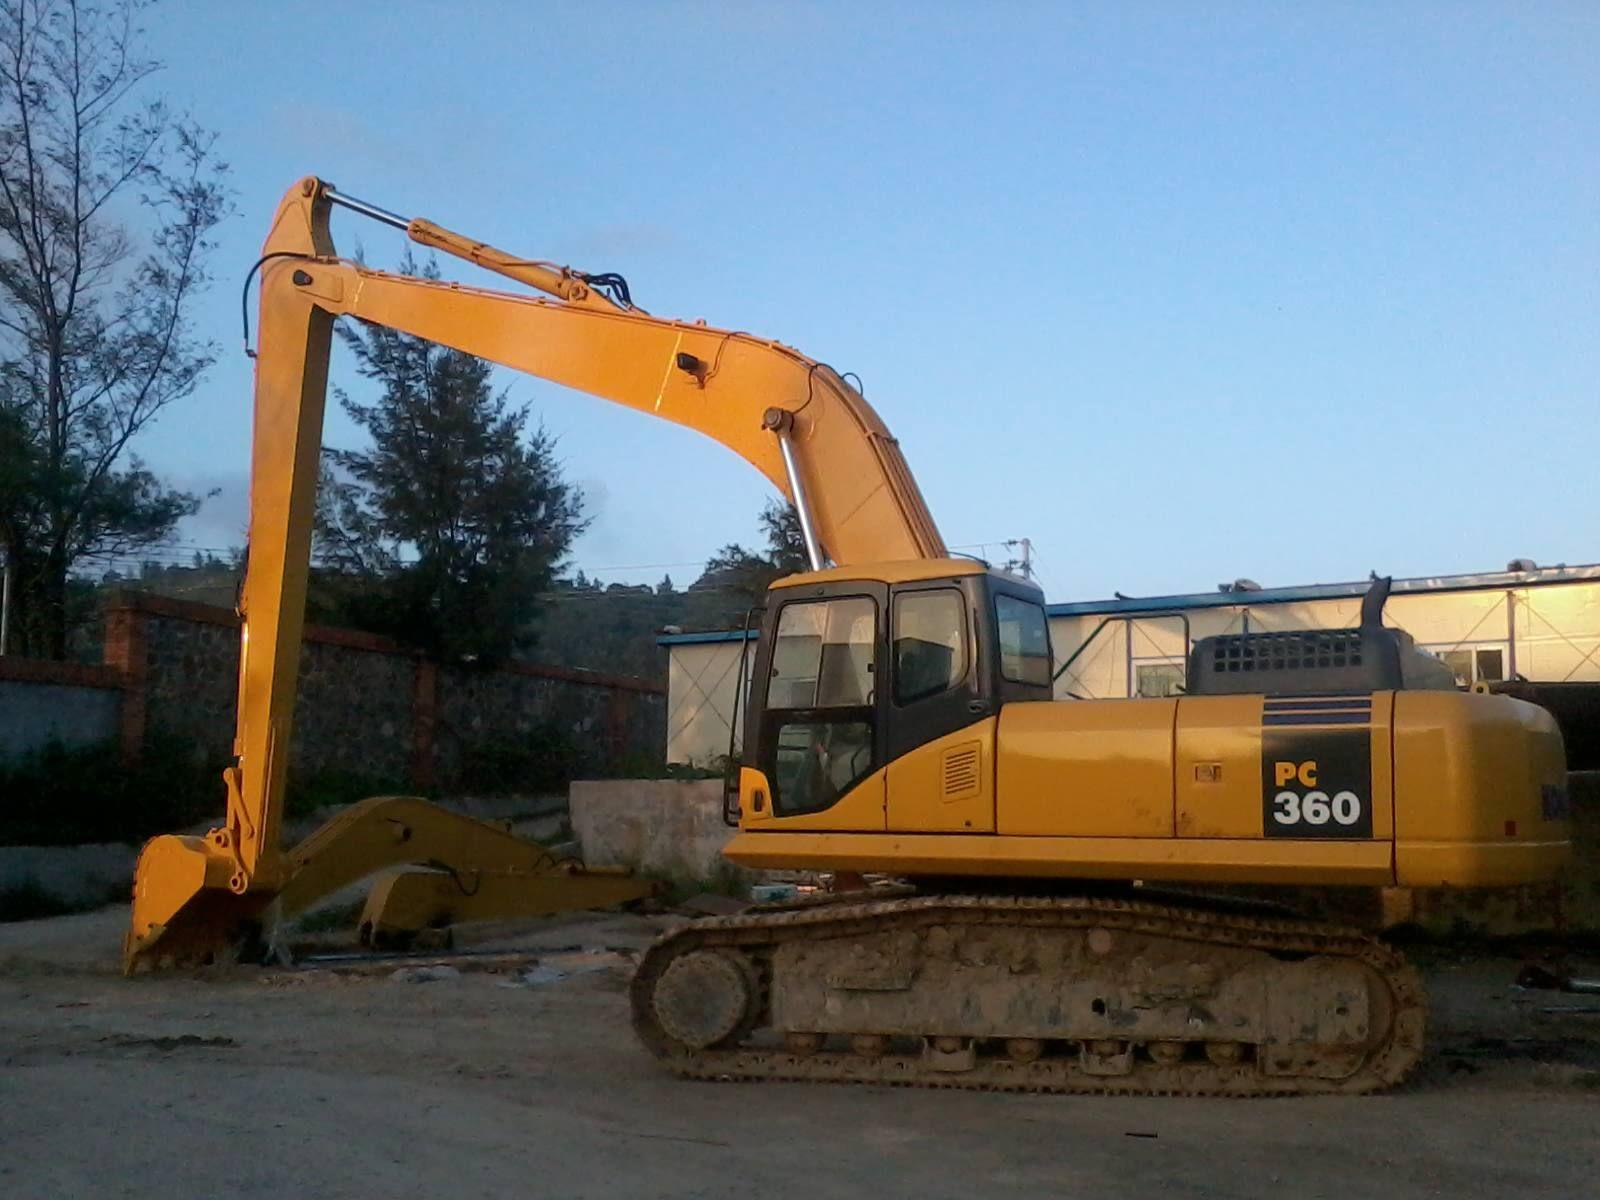 16m long reach boom kit for PC360 Excavator, Boom, Waterway